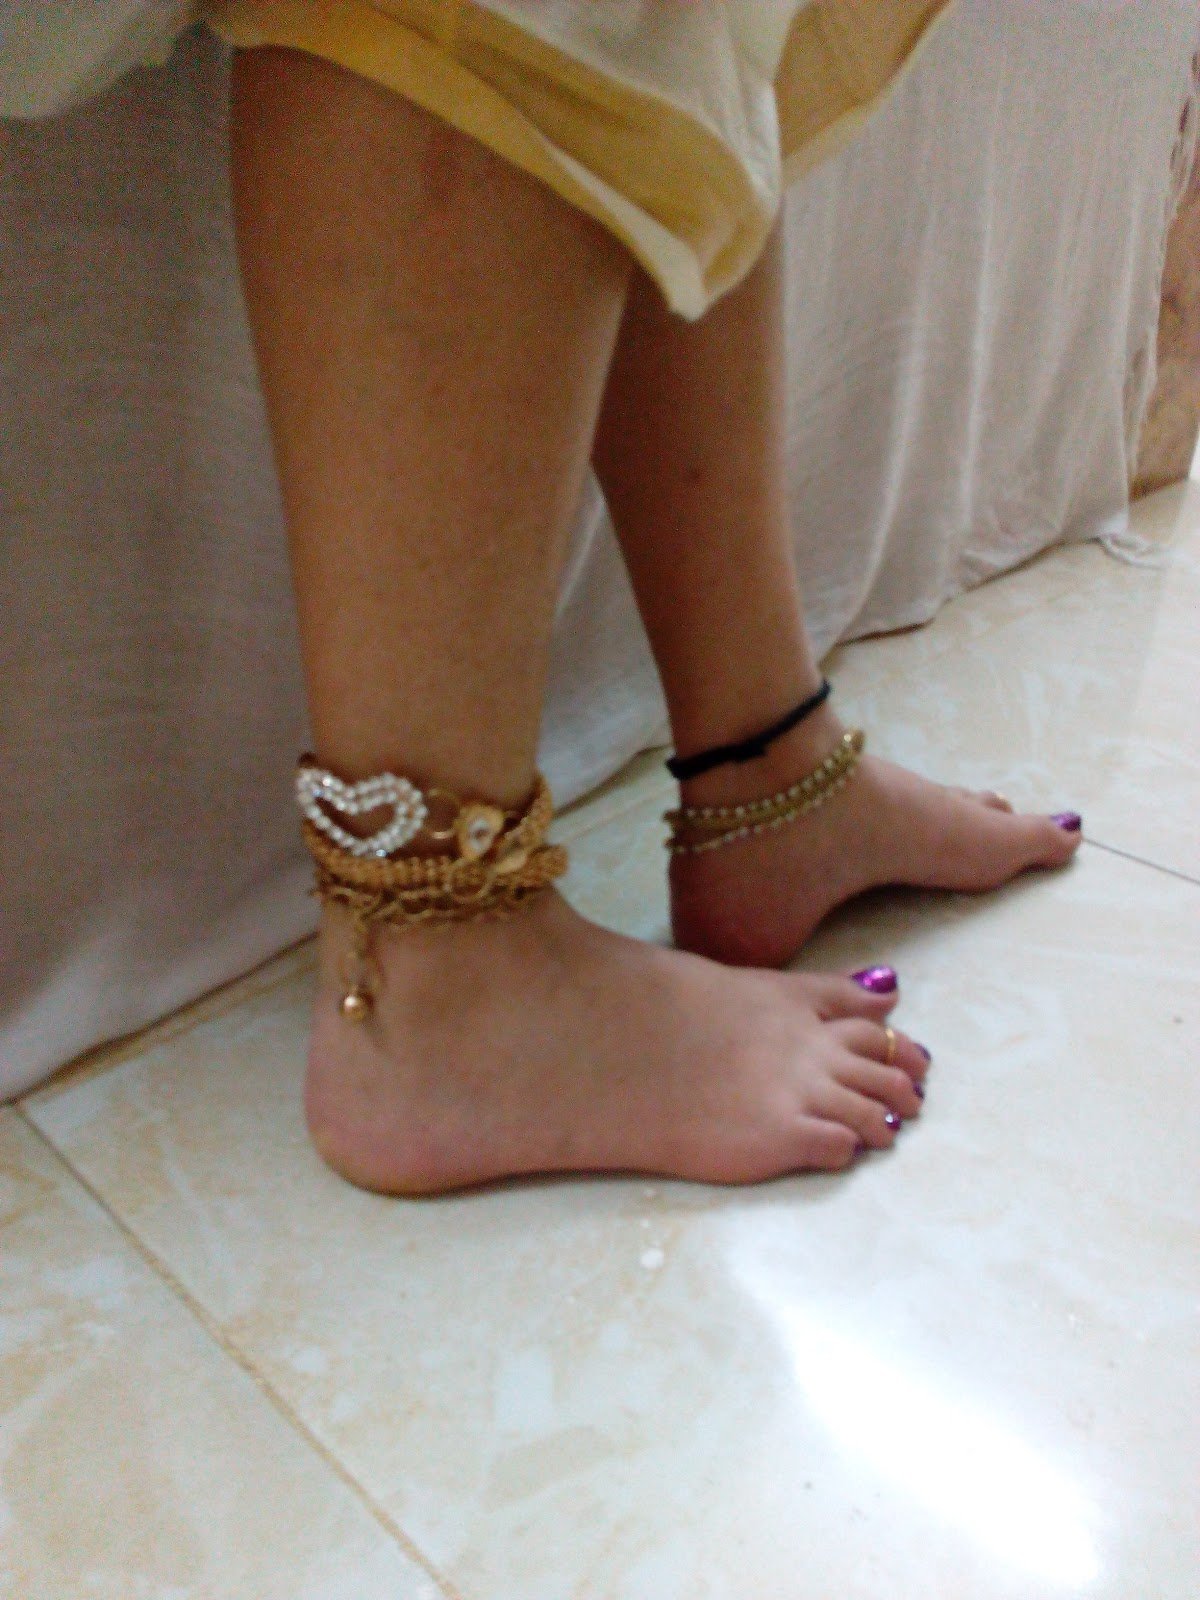 gallery Beautiful feet